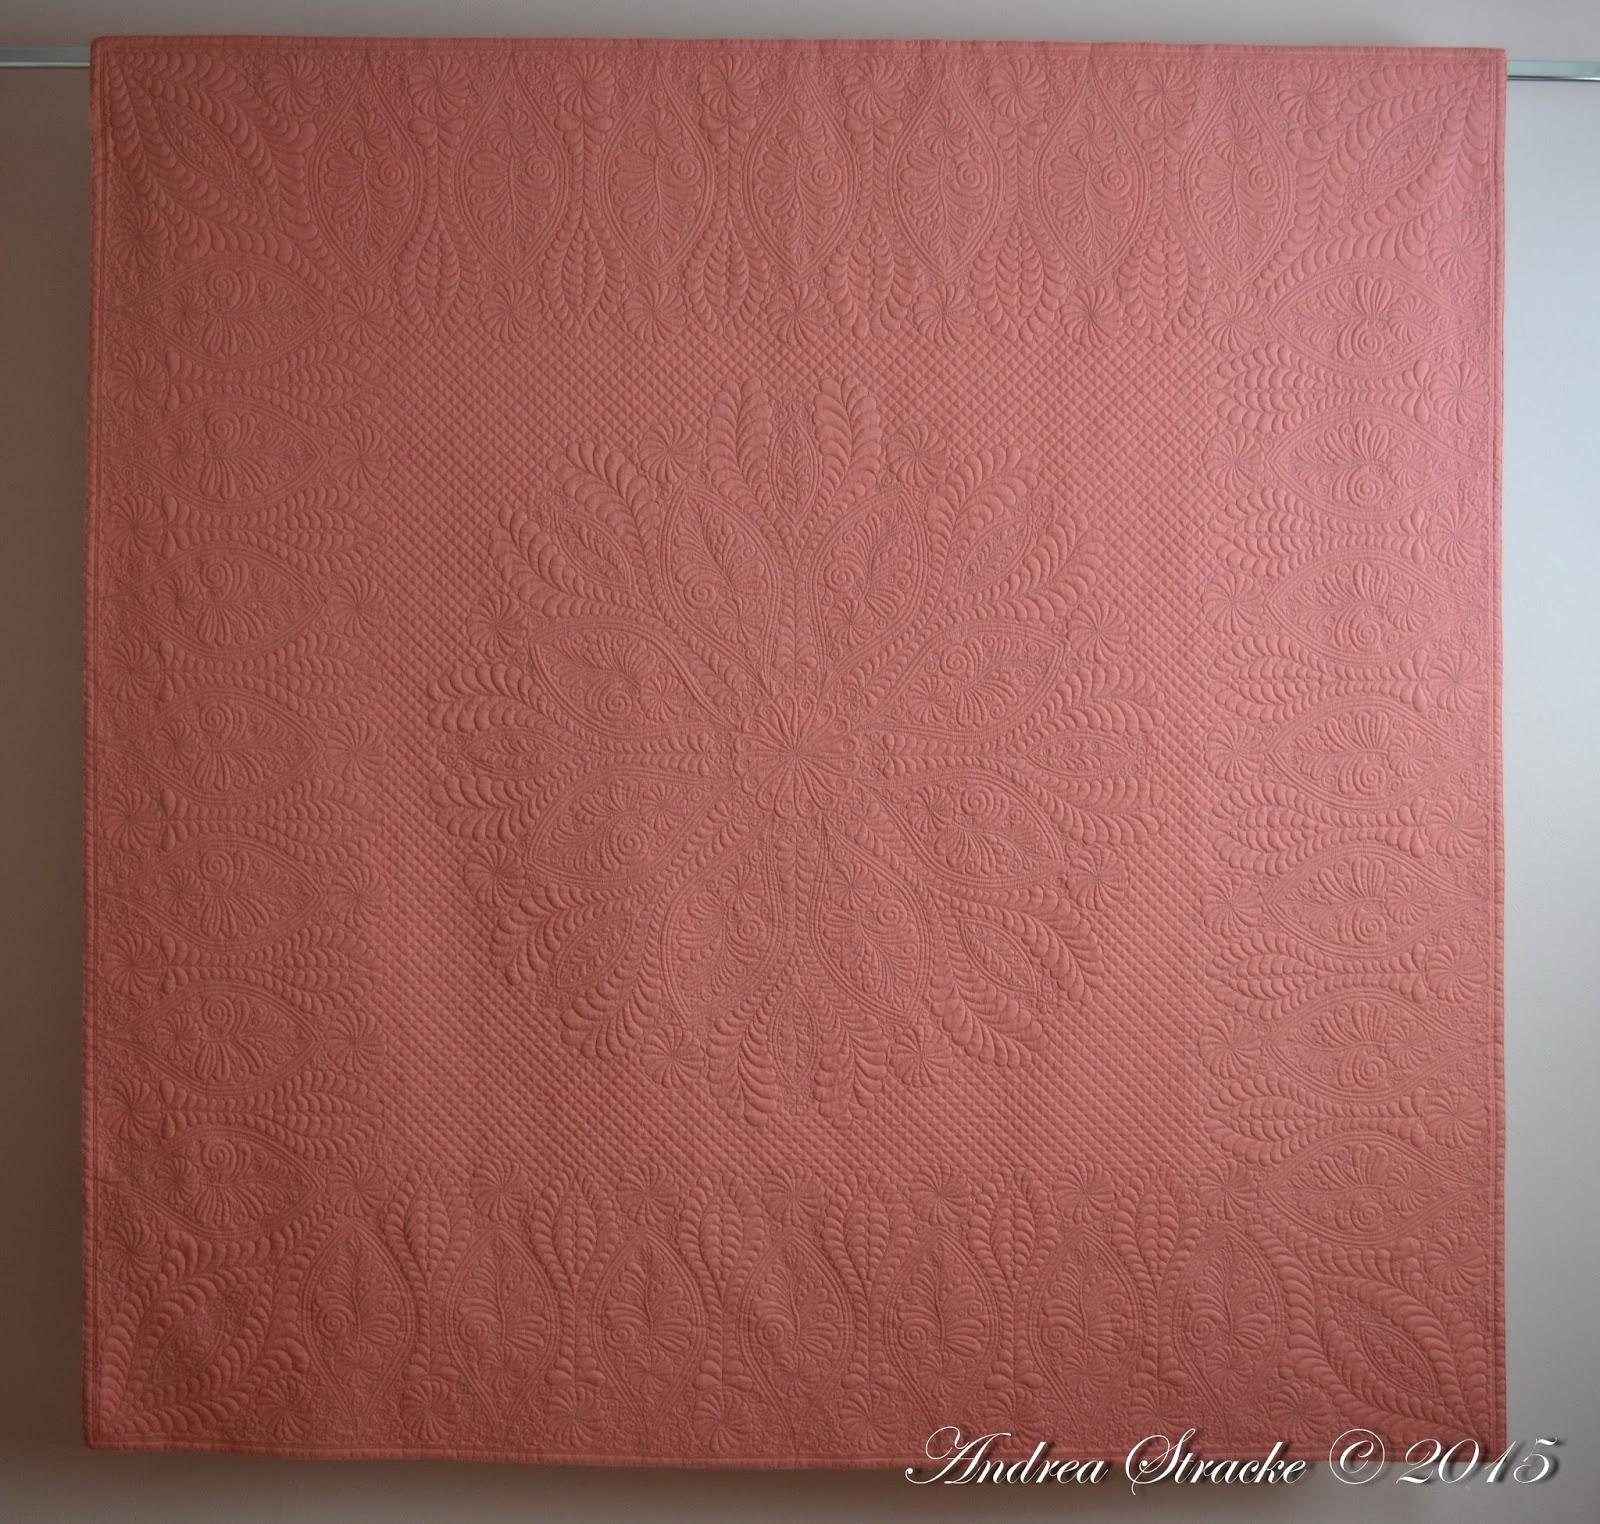 Modern Cologne Quilter: Blind date heute - Quiltkunst/Andrea